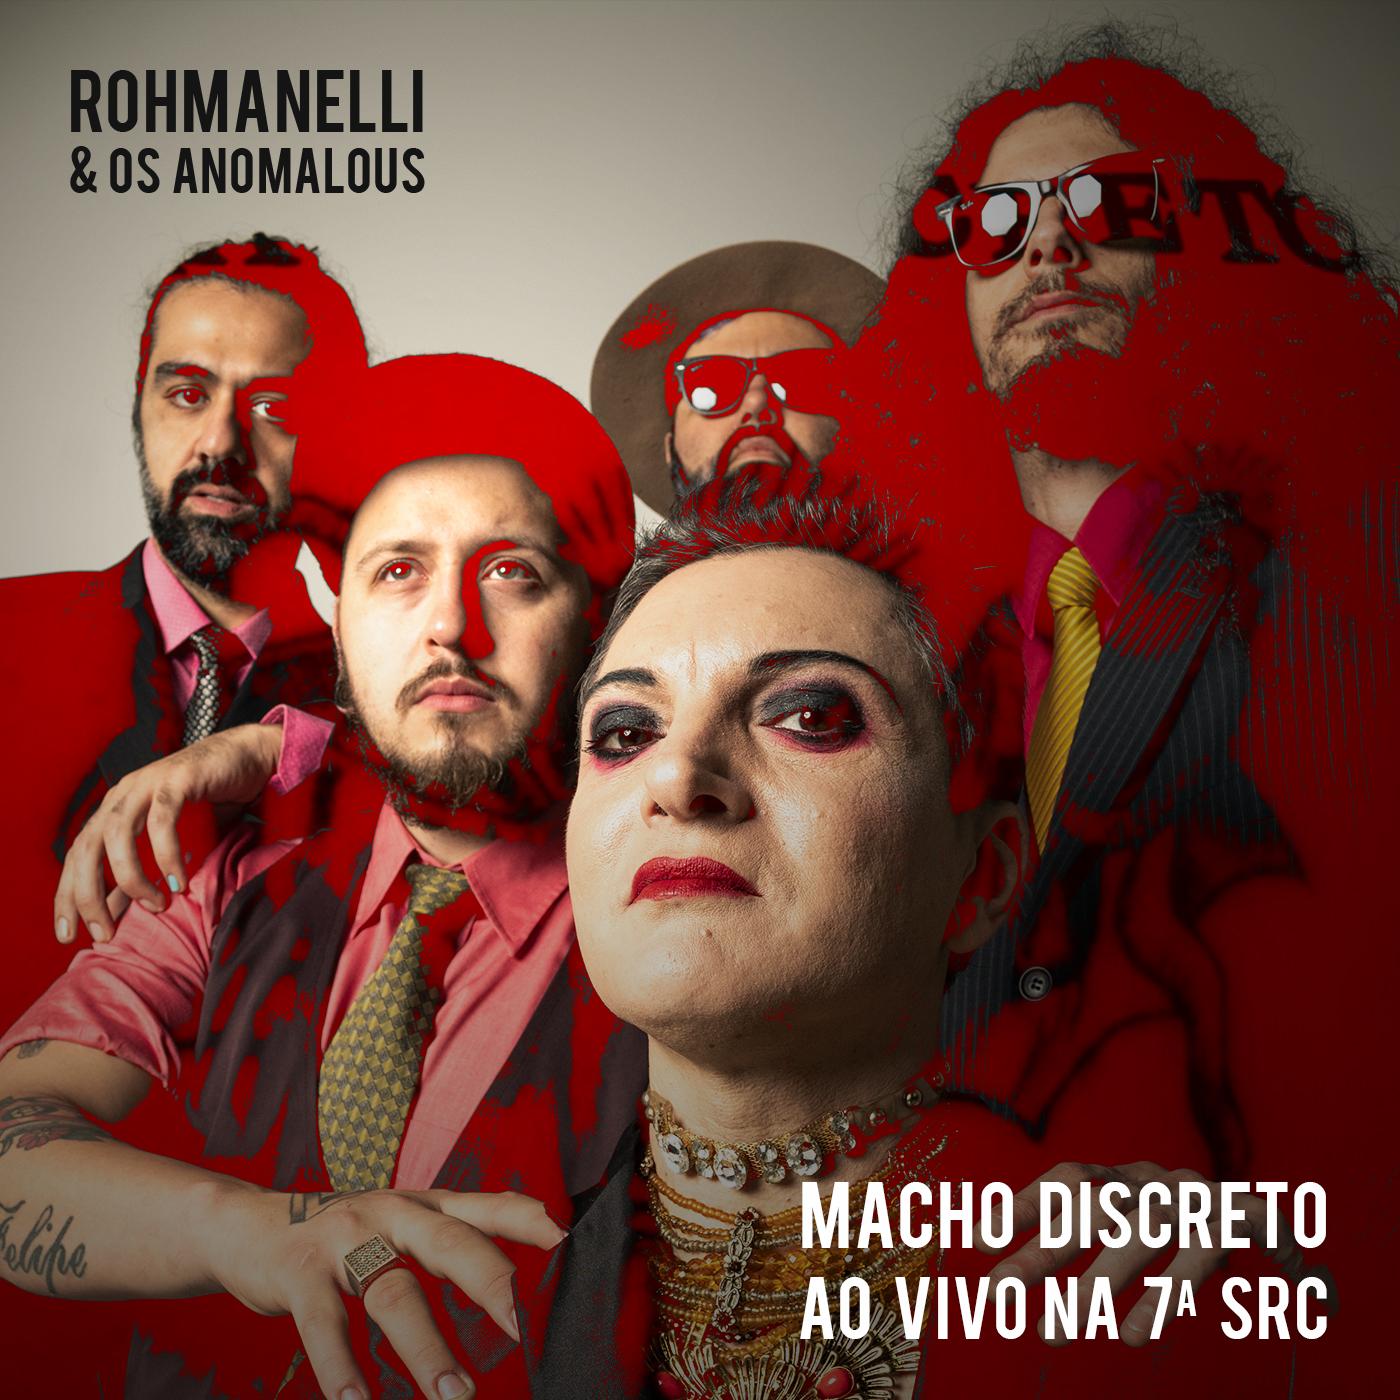 Rohmaneli e Os Anomalous - Macho Discreto Ao vivo na 7ª SRC